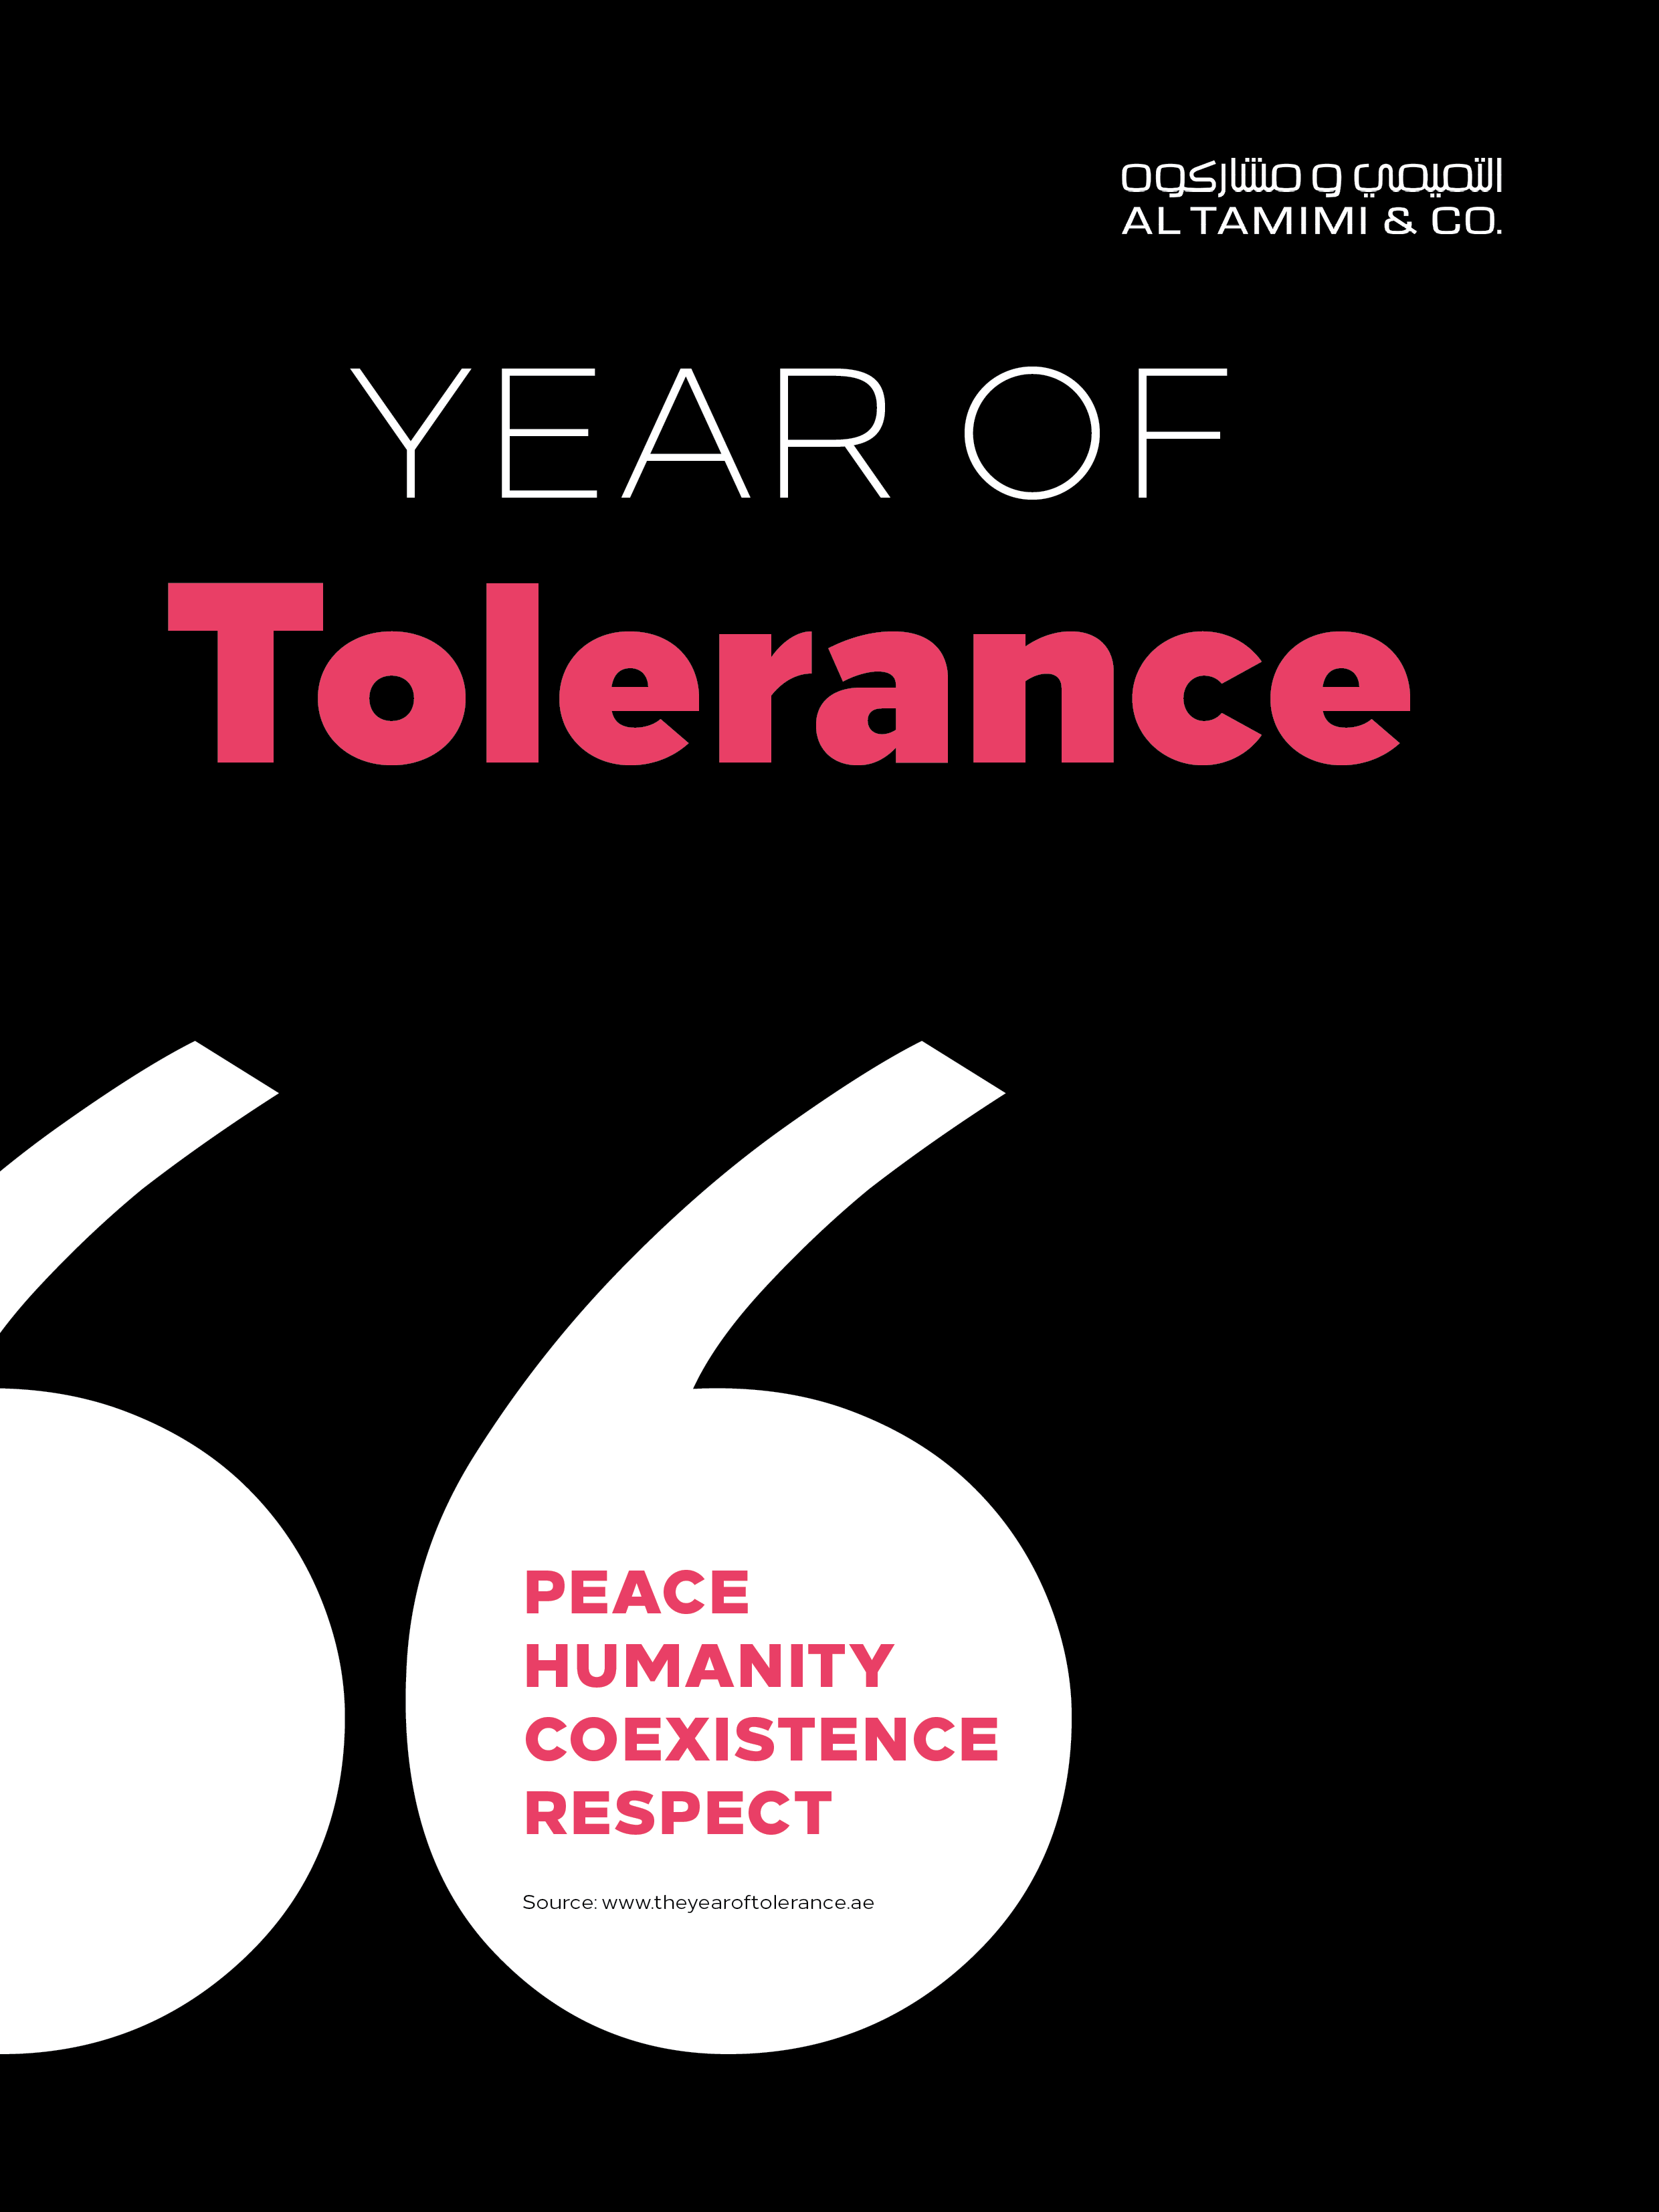 Al Tamimi & Company - UAE Year of Tolerance - App2